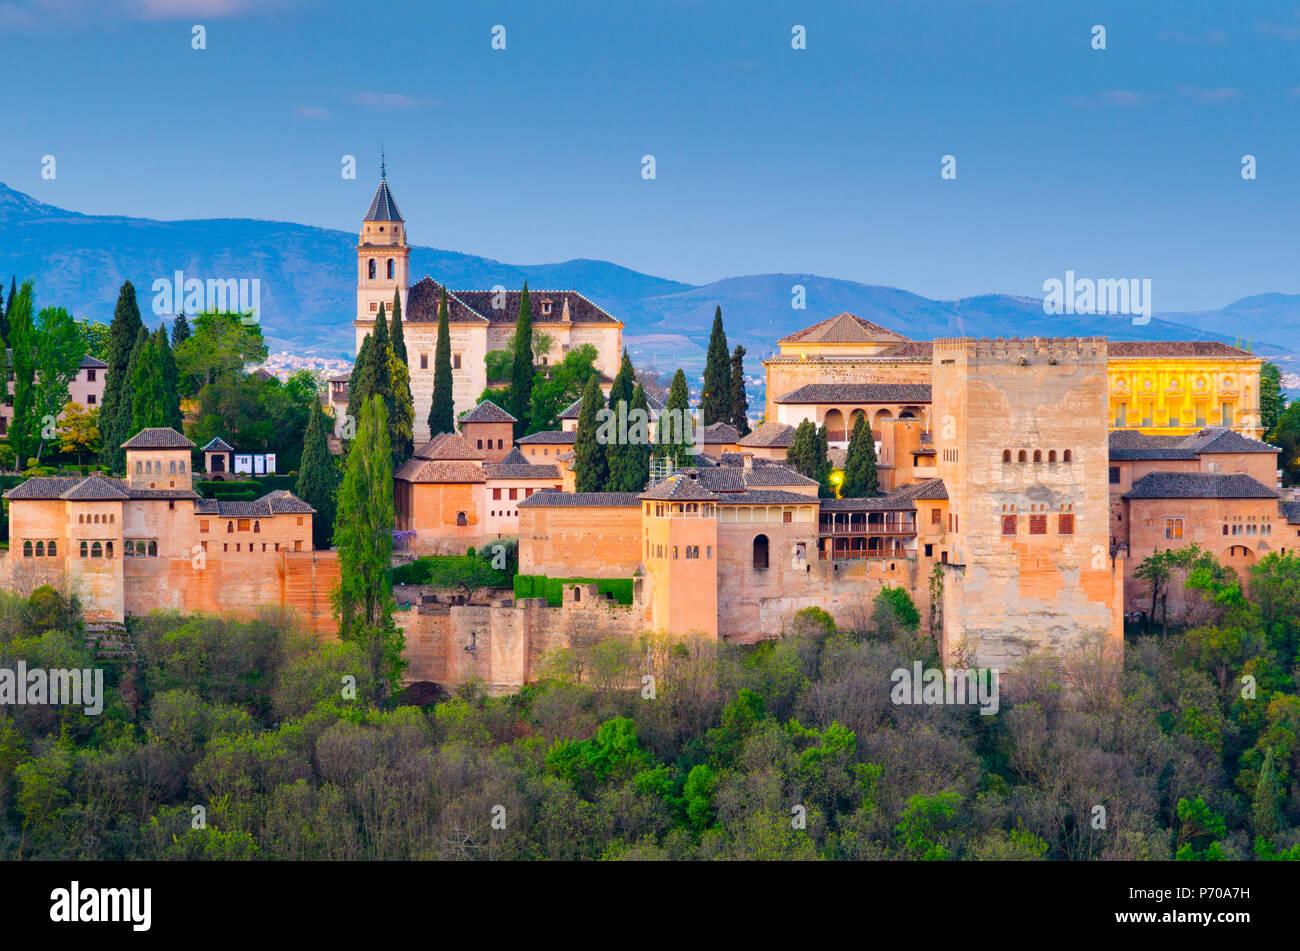 Spain, Andalucia, Granada Province, Granada, Alhambra Palace - Stock Image